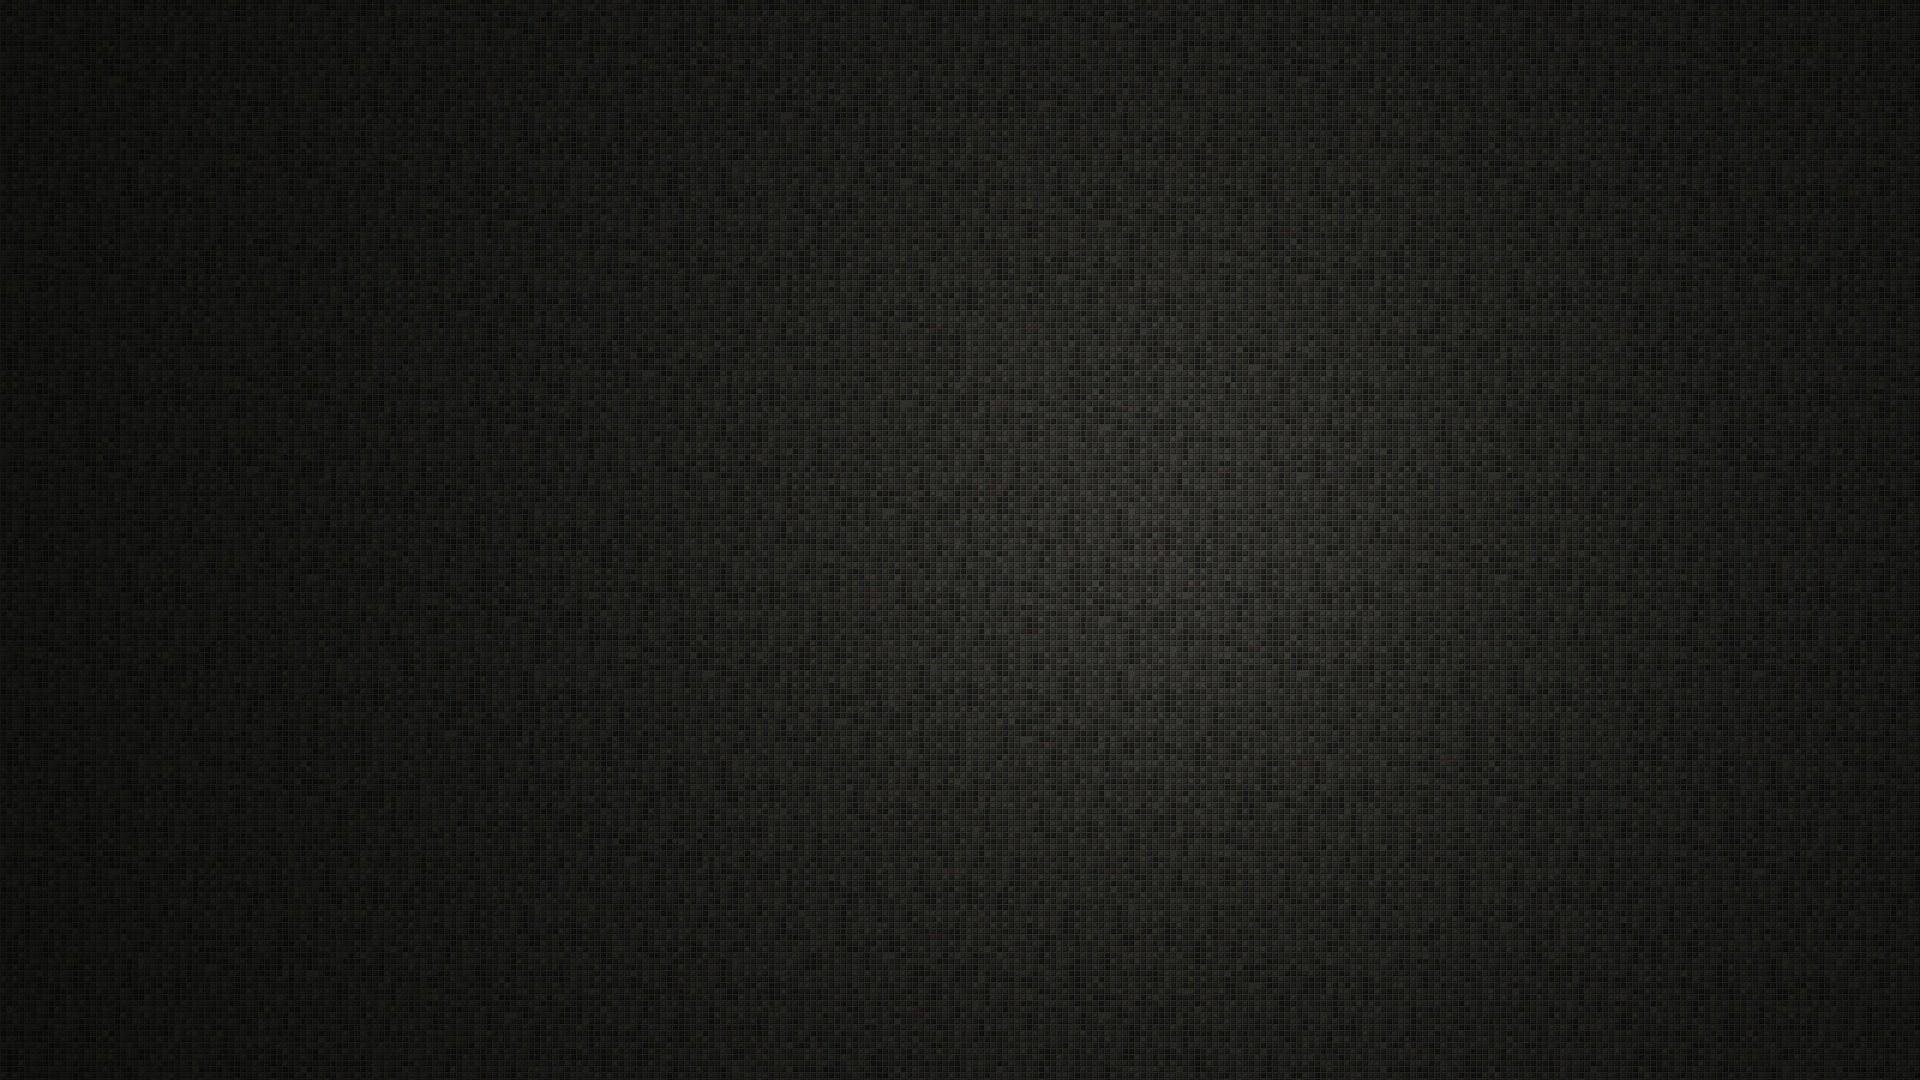 black texture wallpaper 1920x1080 - photo #1